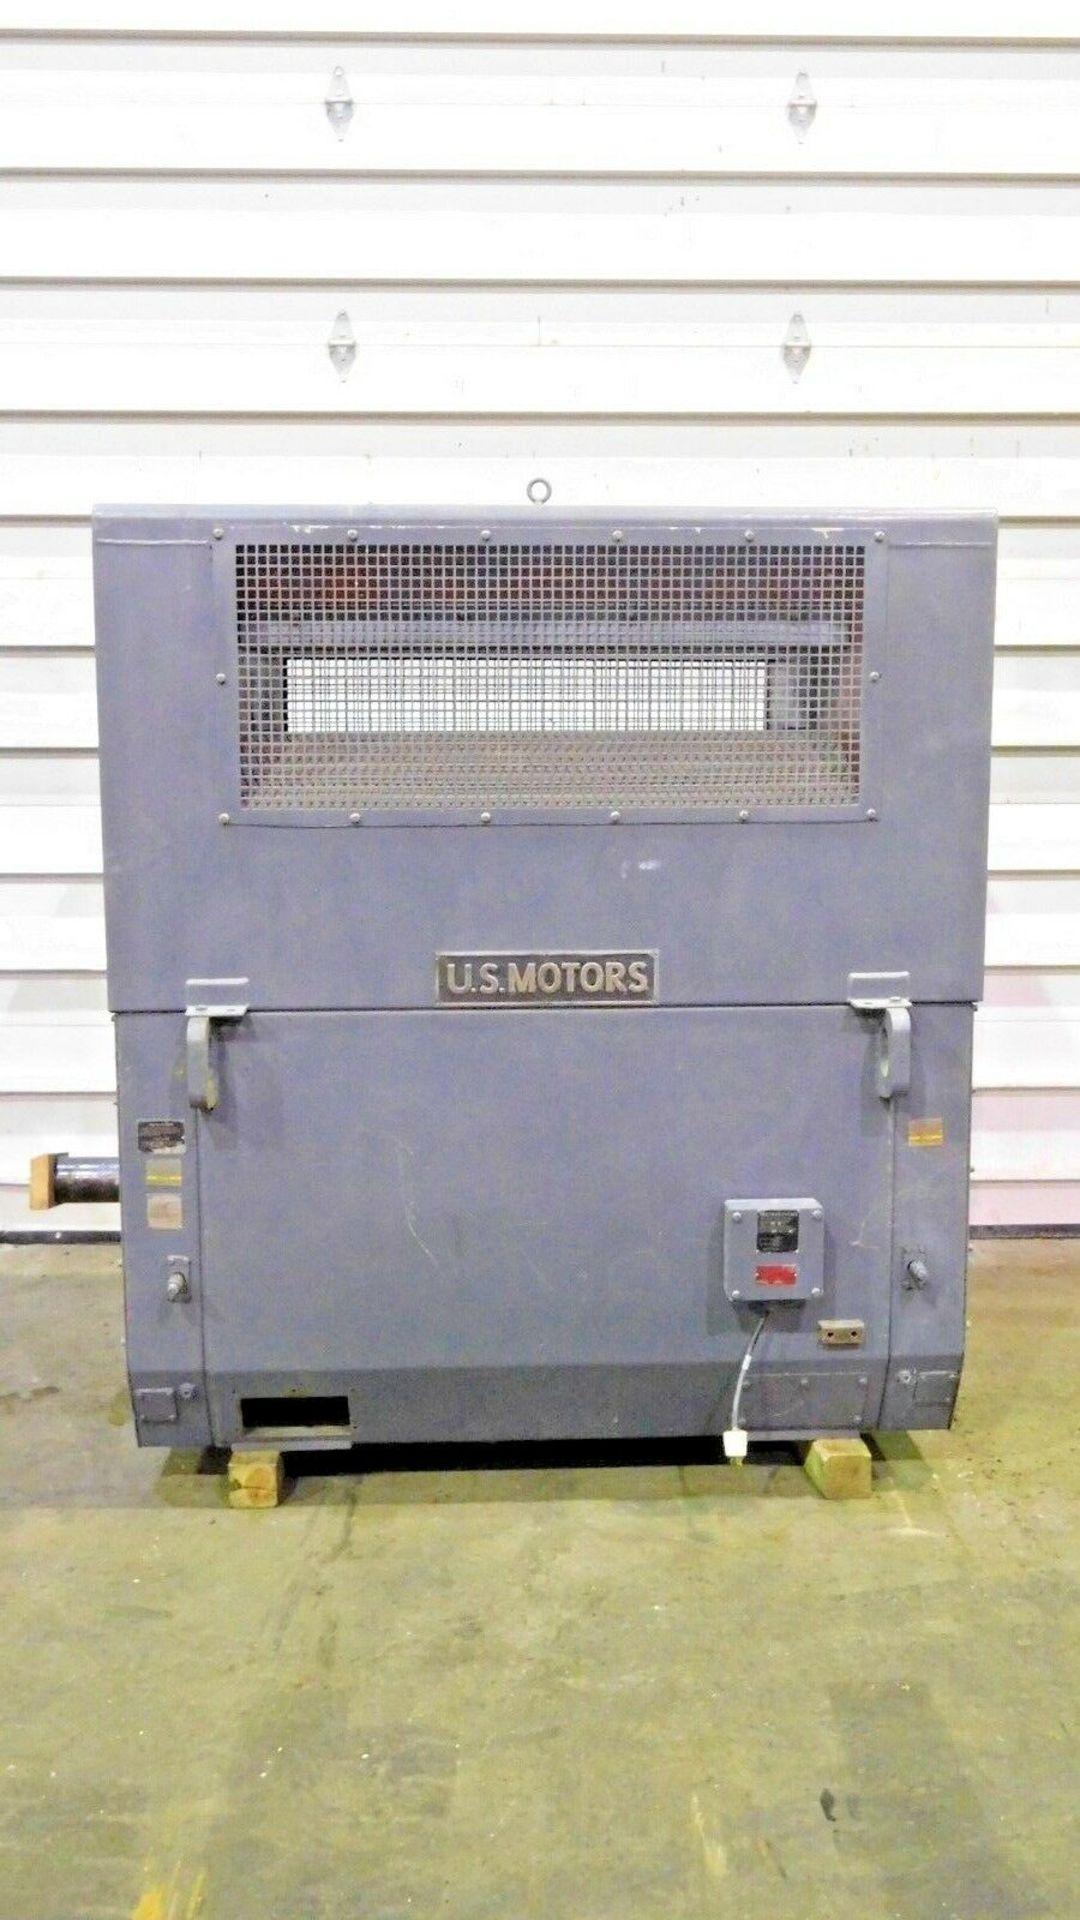 US Motors 600 HP Electric Motor. 890 RPM. 4000 V. 6809S. Type MS. 60 Hz. 3 Ph.